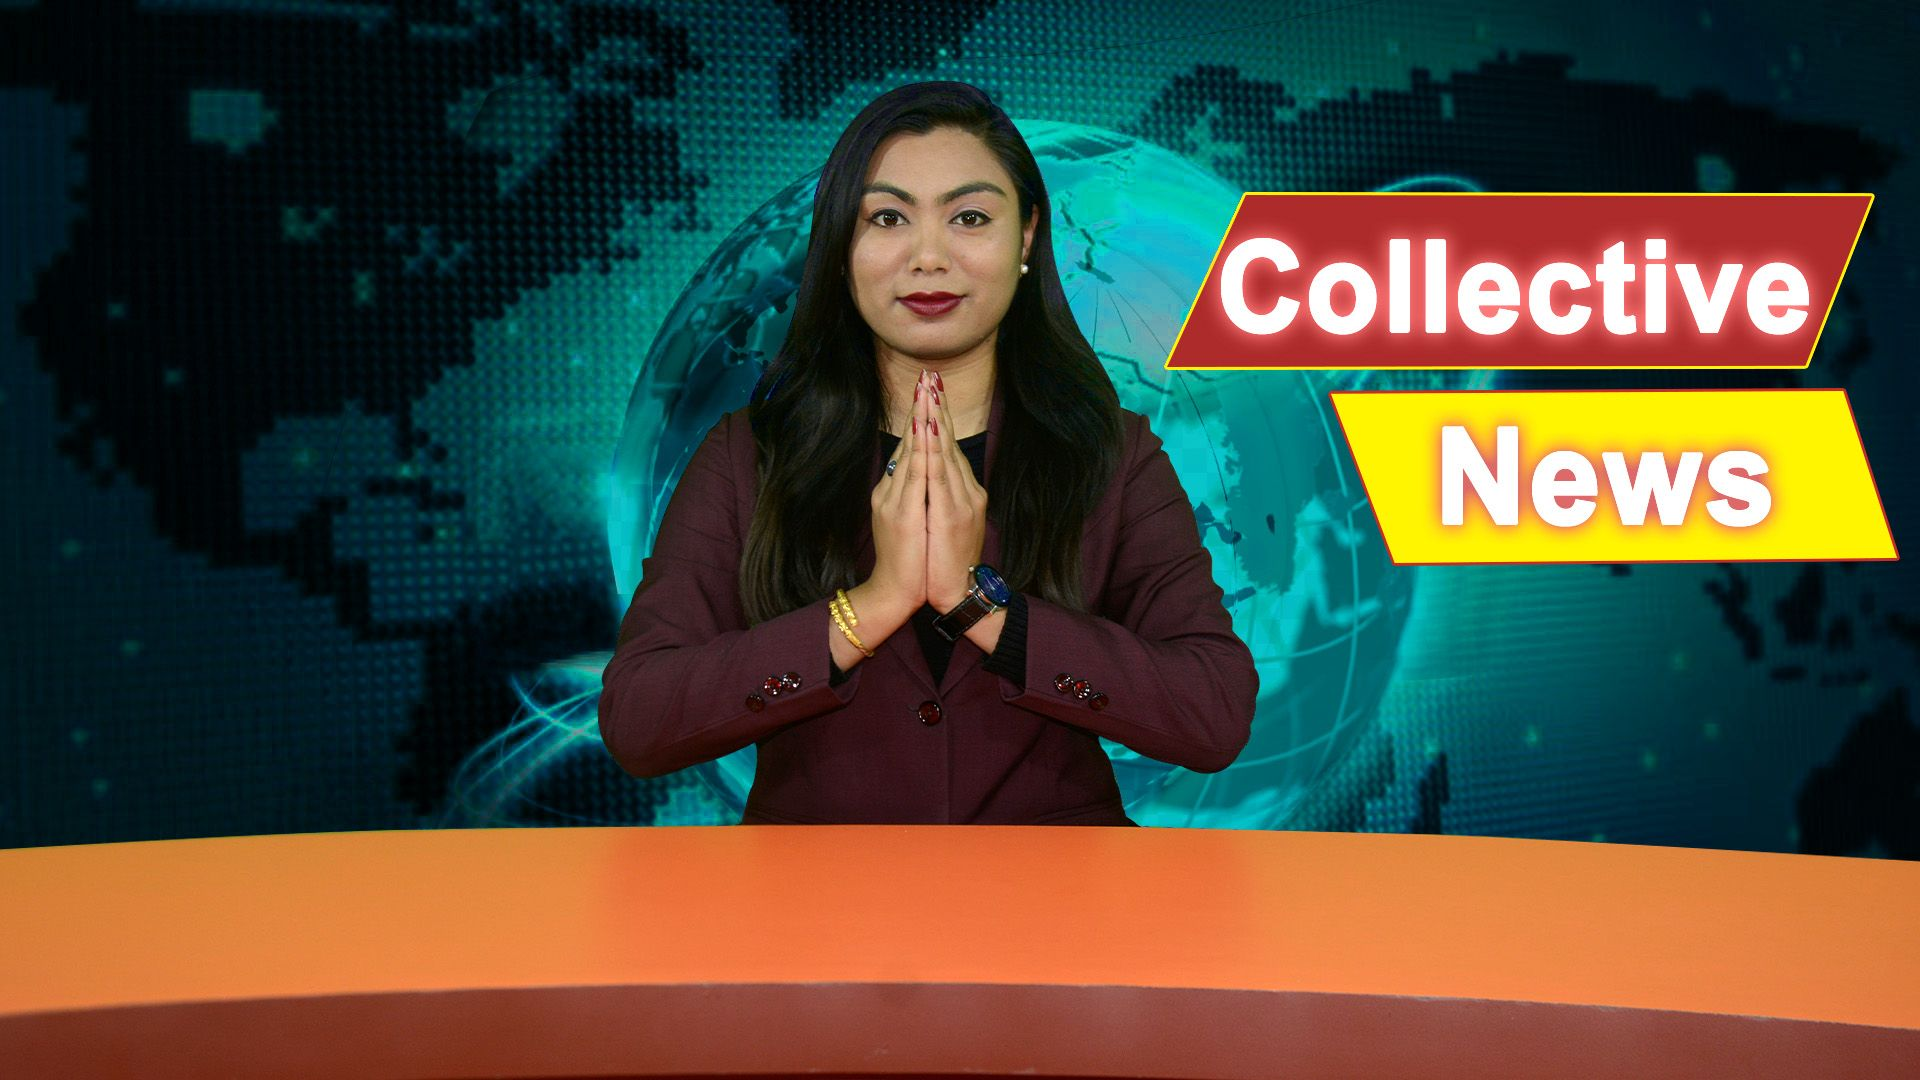 Collective News